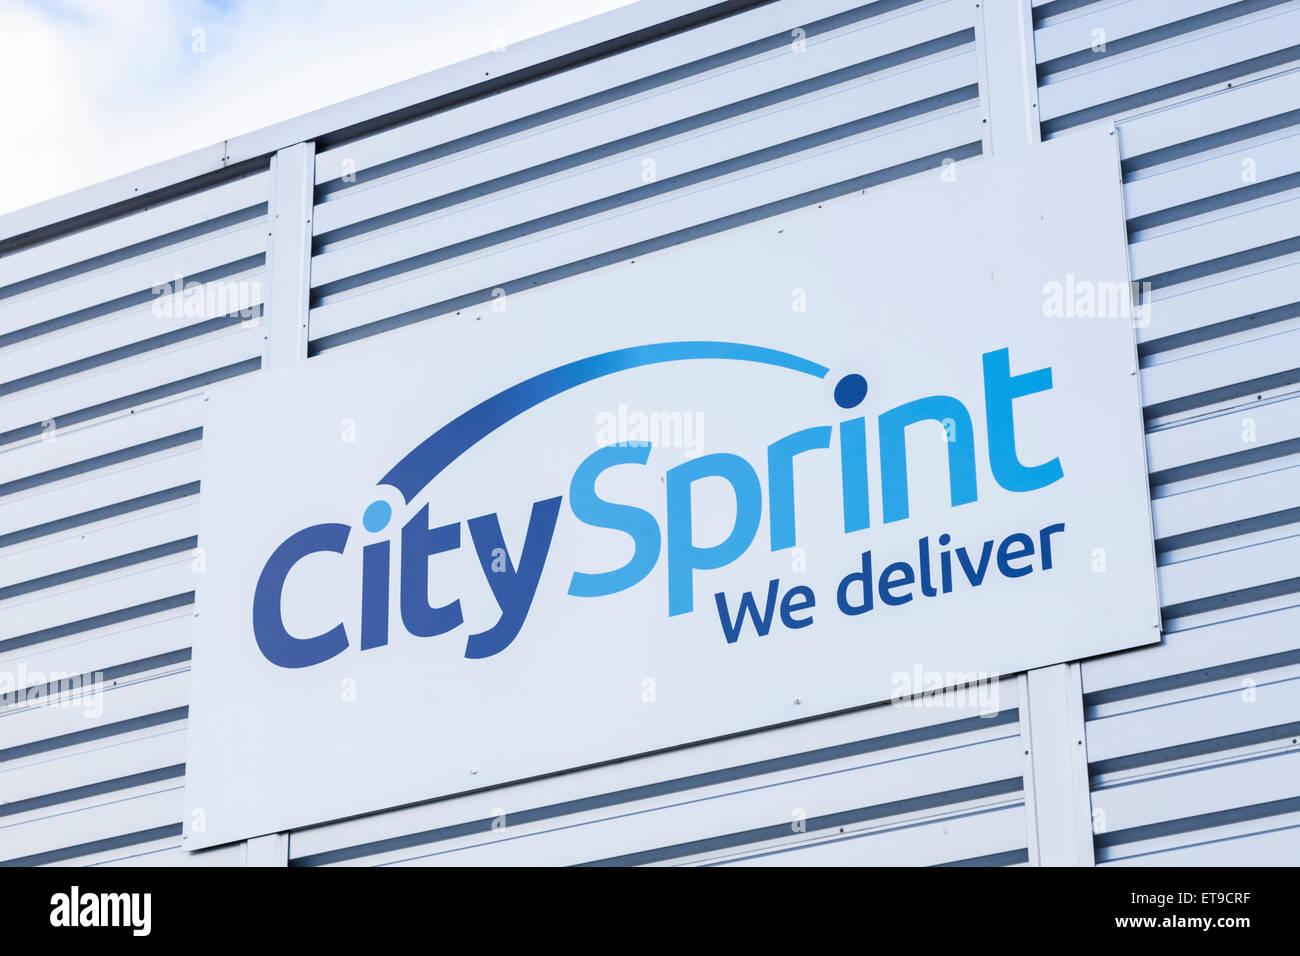 City Sprint Stock Photos City Sprint Stock Images Alamy